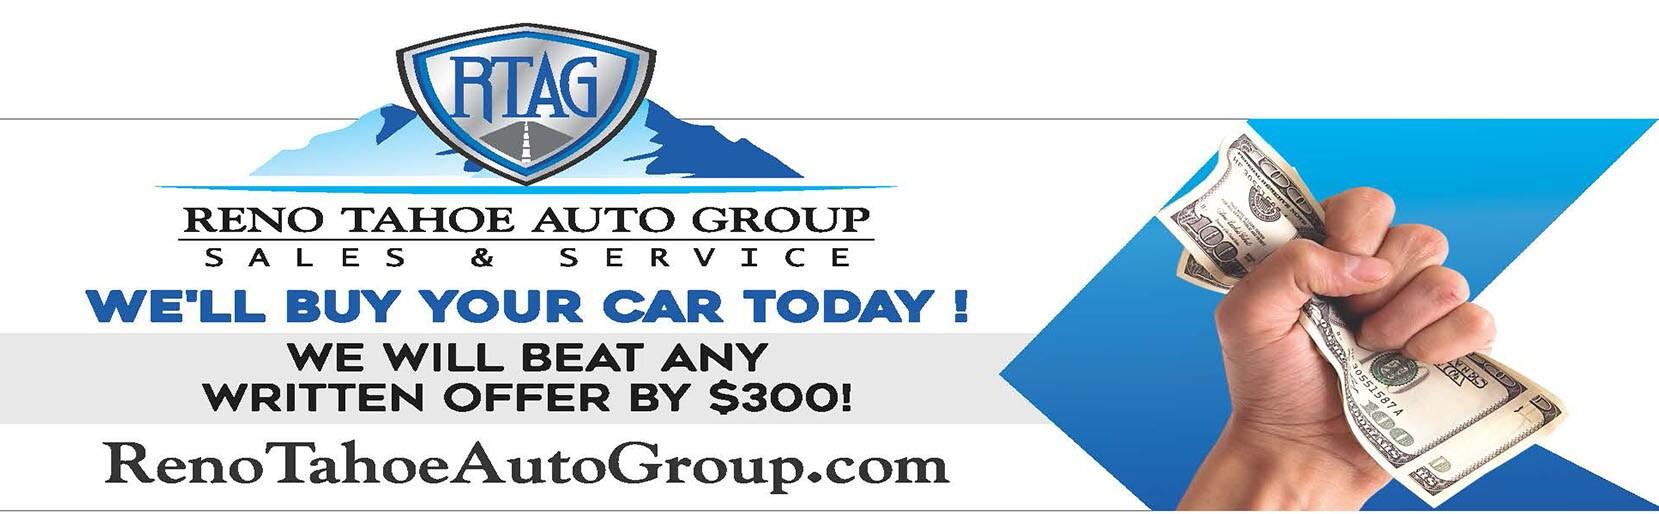 Reno Tahoe Auto Group - Used Car & Truck Dealership in RENO